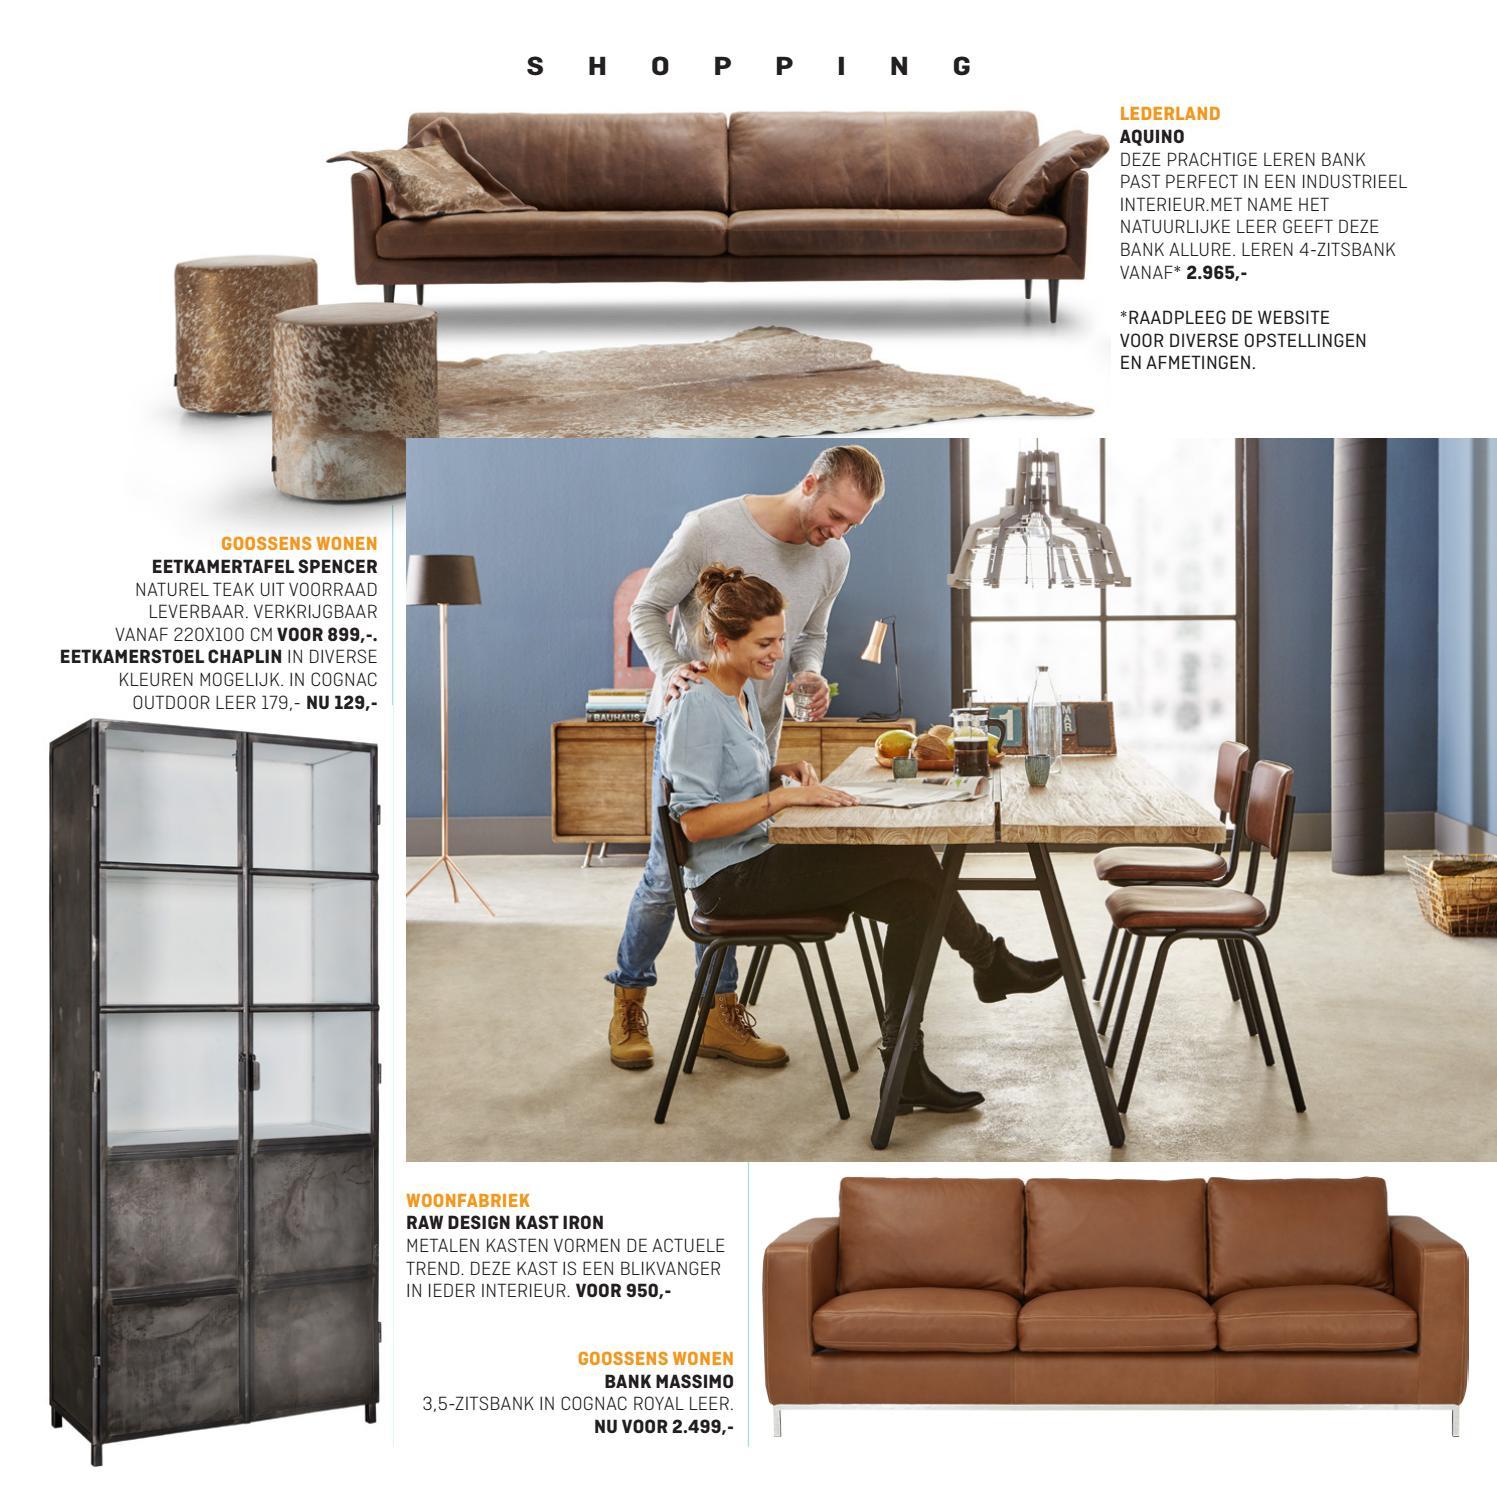 Goossens Design Bank.Villa Arena Magazine Herfst Thema Industrieel Wonen By Villa Arena